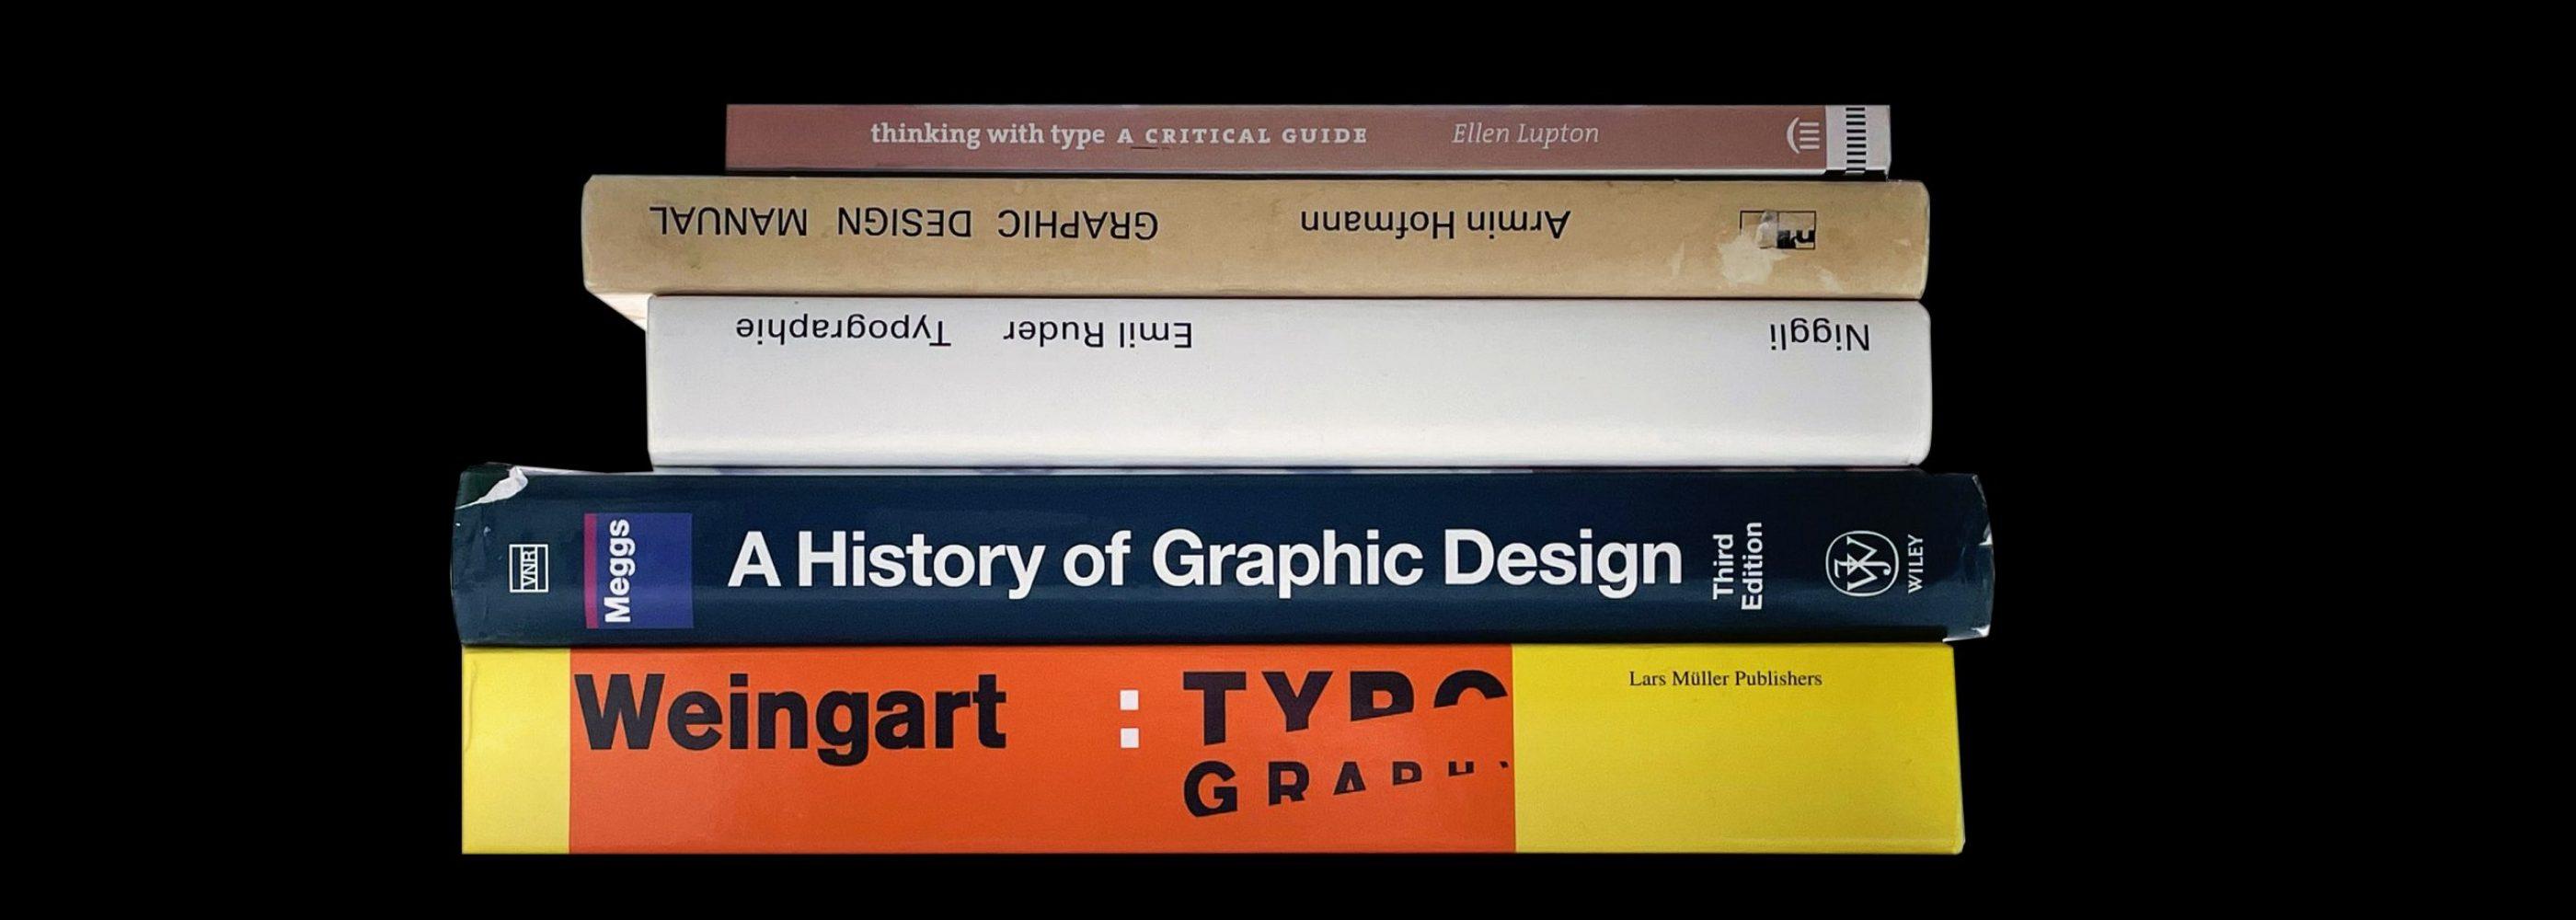 design-book-recommendations-copy-1